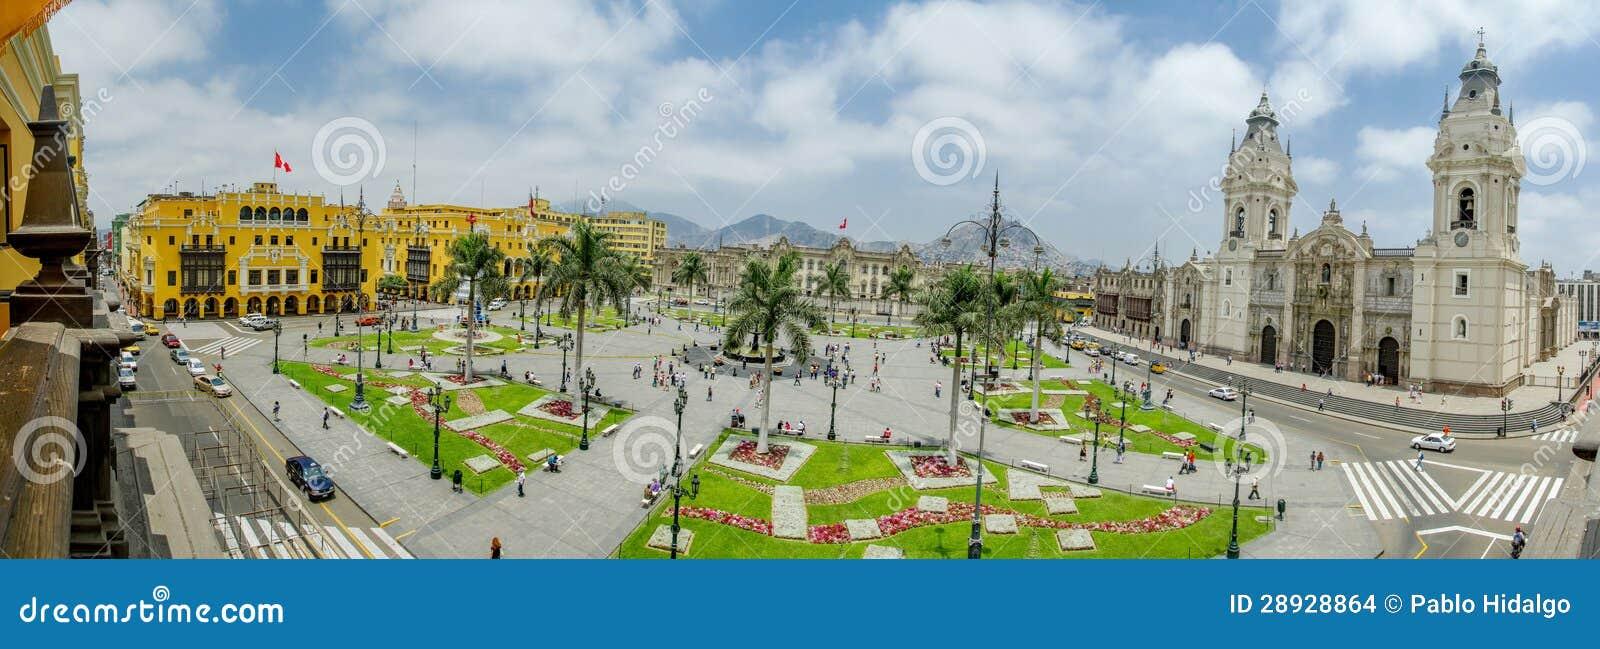 Plaza De Armas In Lima Peru 180 View Stock Photo Image